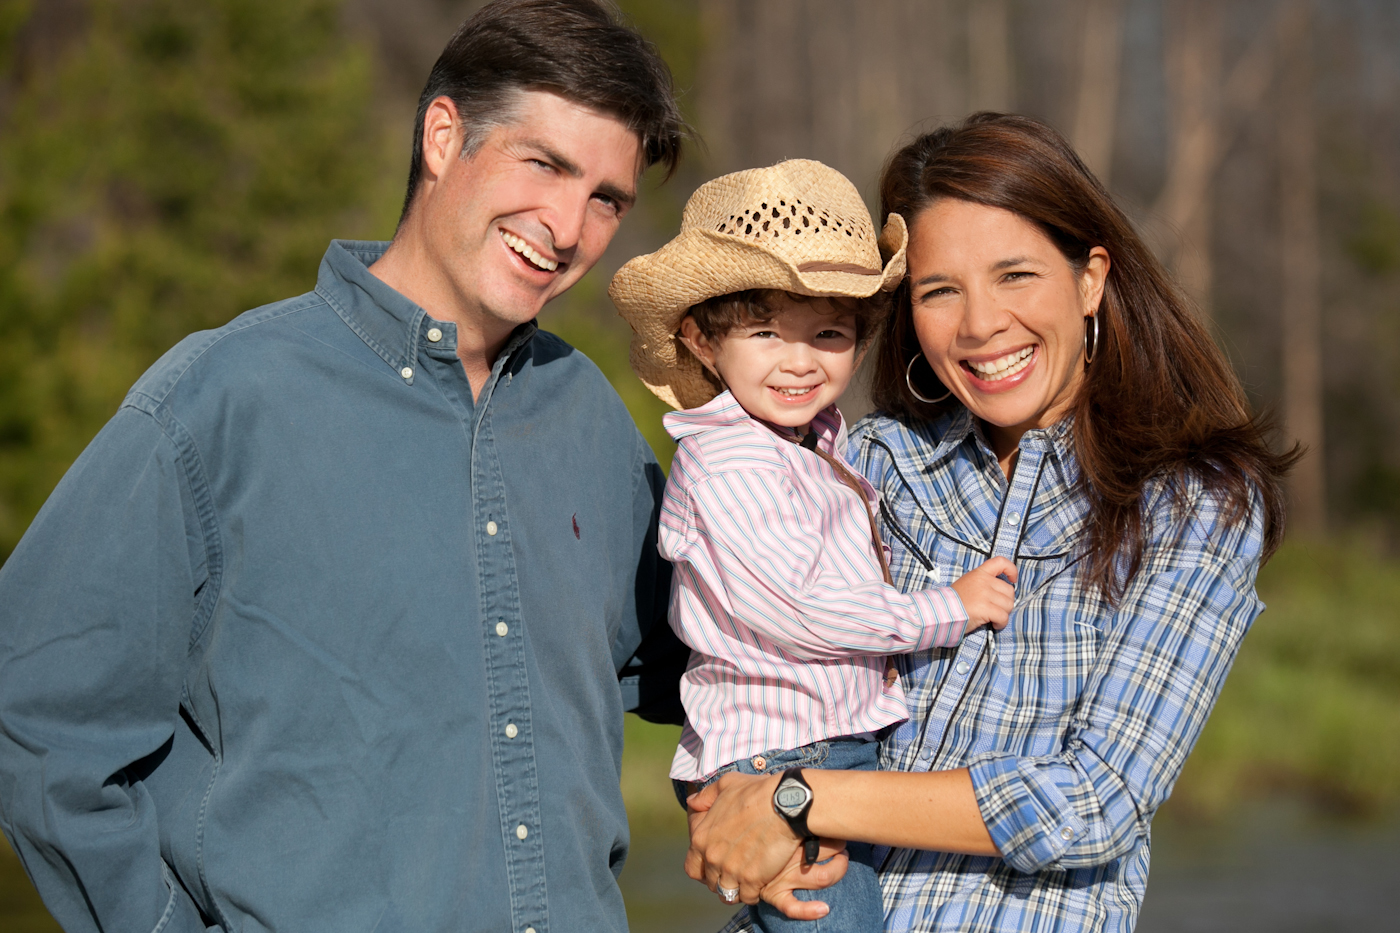 Vail_Beaver_Creek_Family_Portrait_Photography_001.jpg